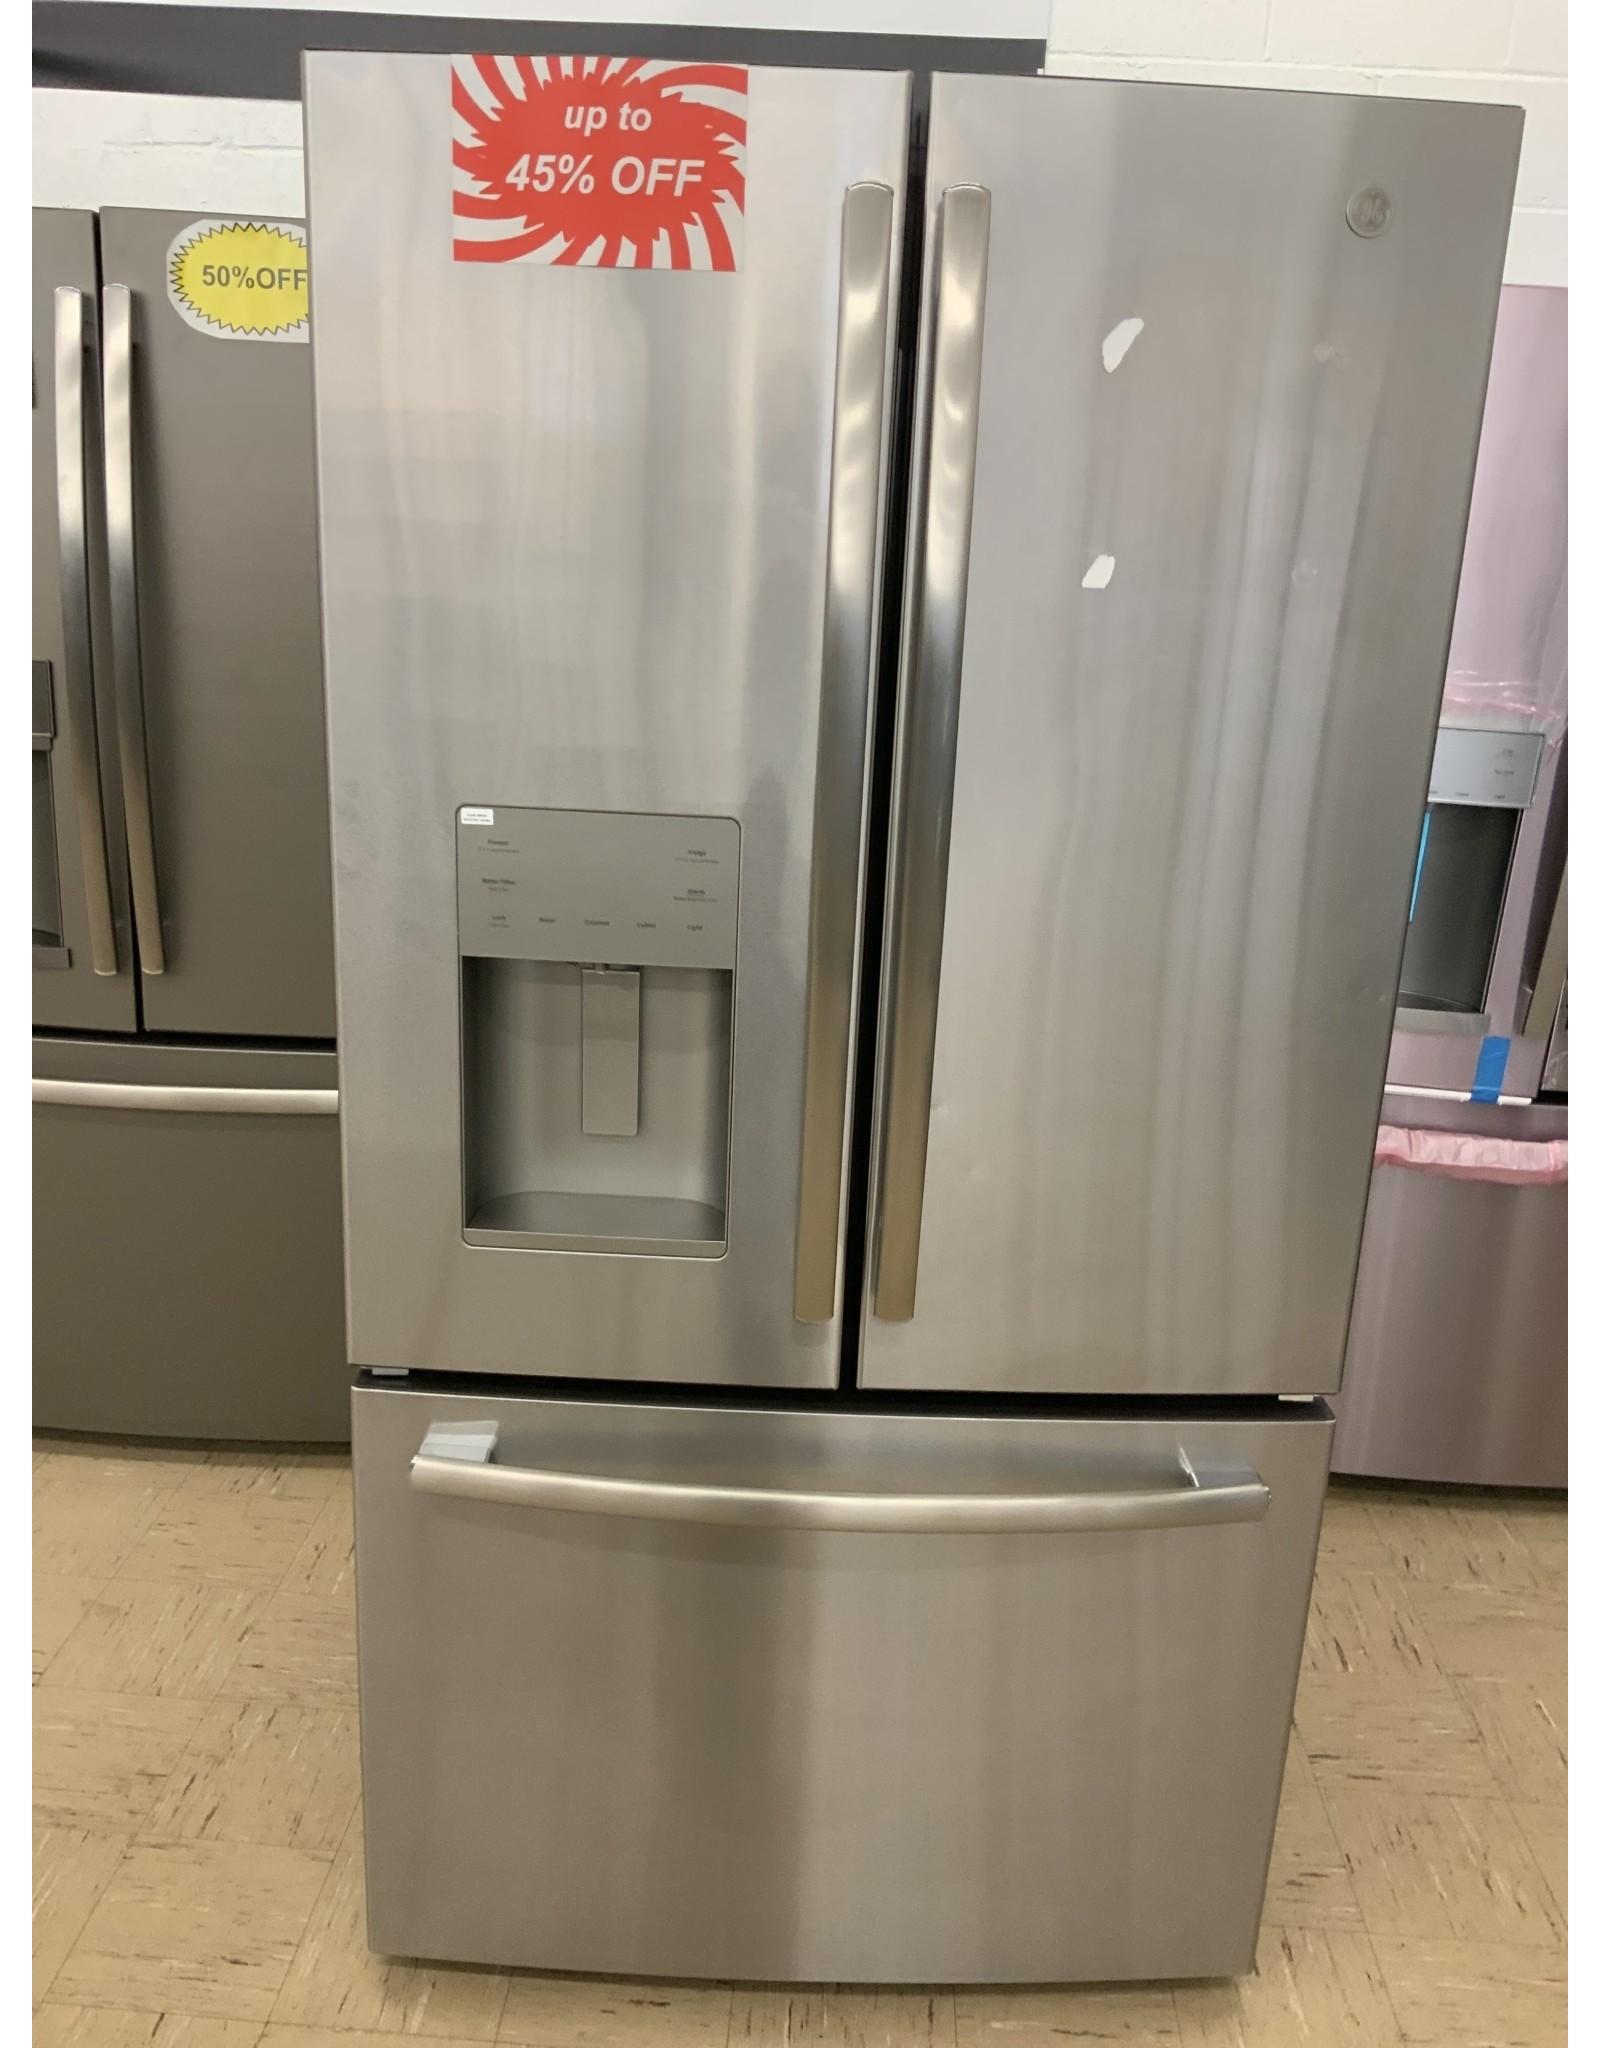 SAMSUNG RF27T5201SR 27 cu. ft. French Door Refrigerator in Fingerprint Resistant Stainless Steel